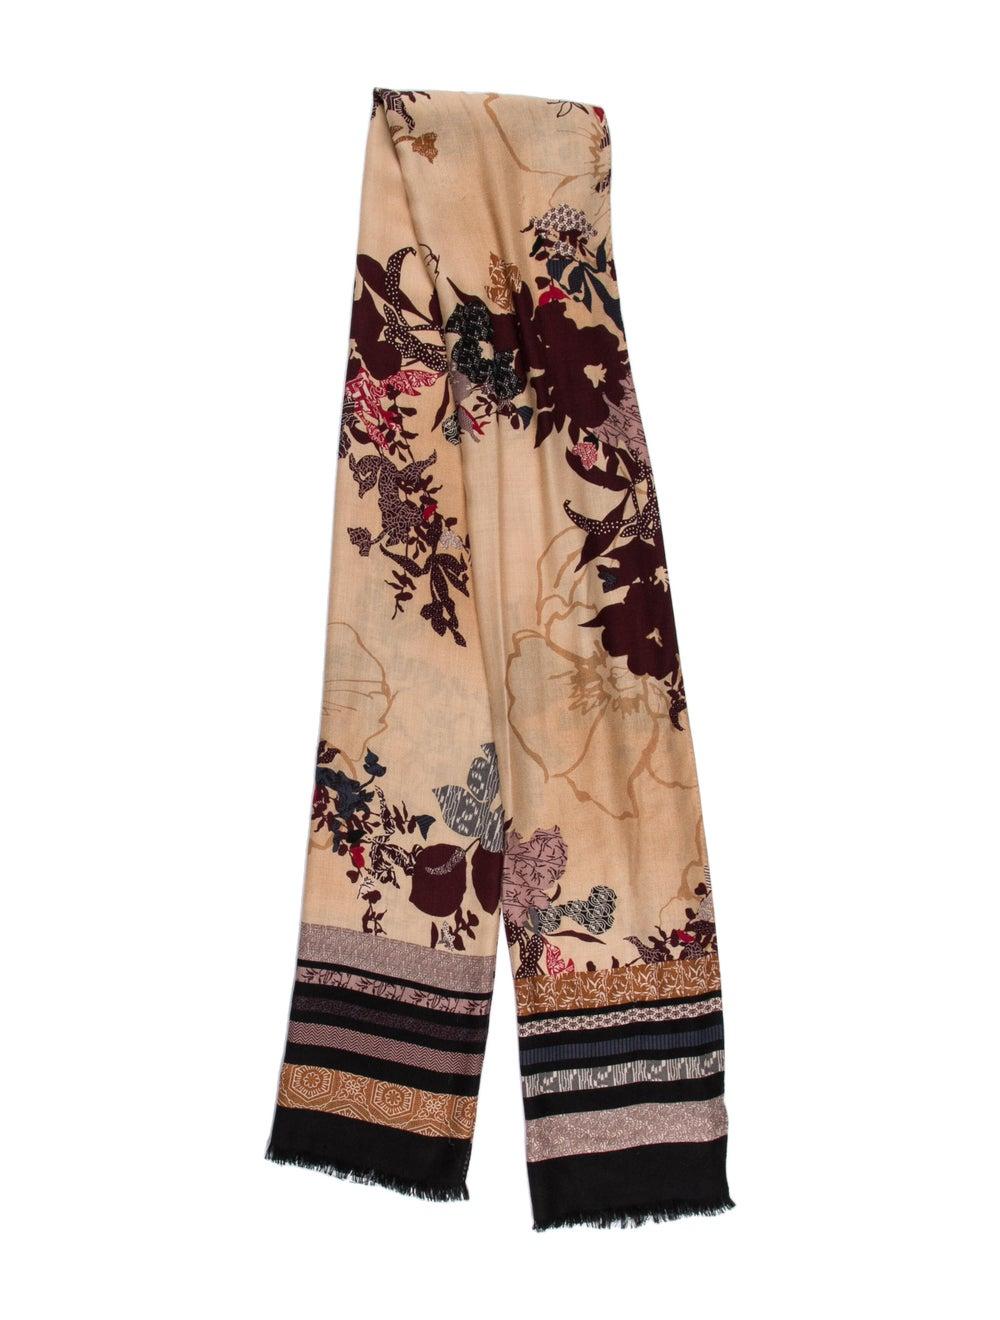 Gucci Silk Floral Print Scarf w/ Tags - image 1